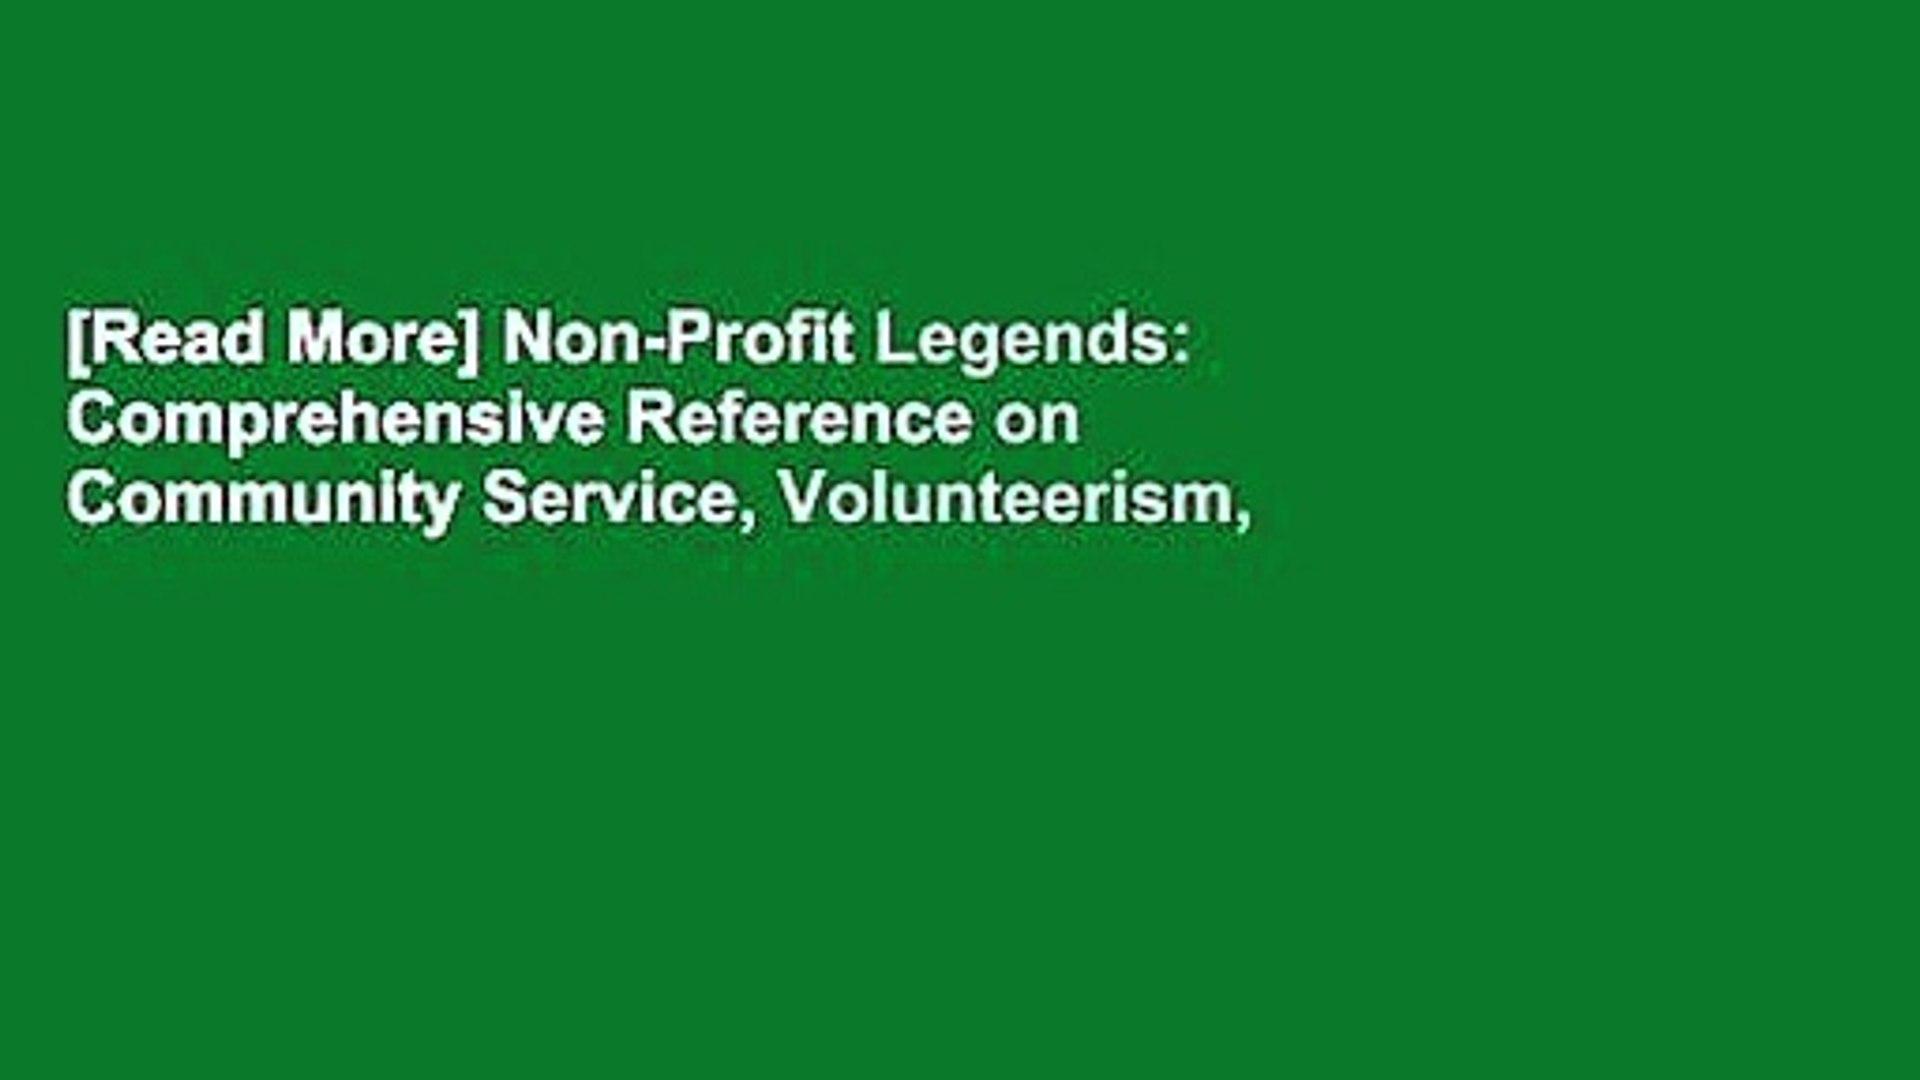 [Read More] Non-Profit Legends: Comprehensive Reference on Community Service, Volunteerism,